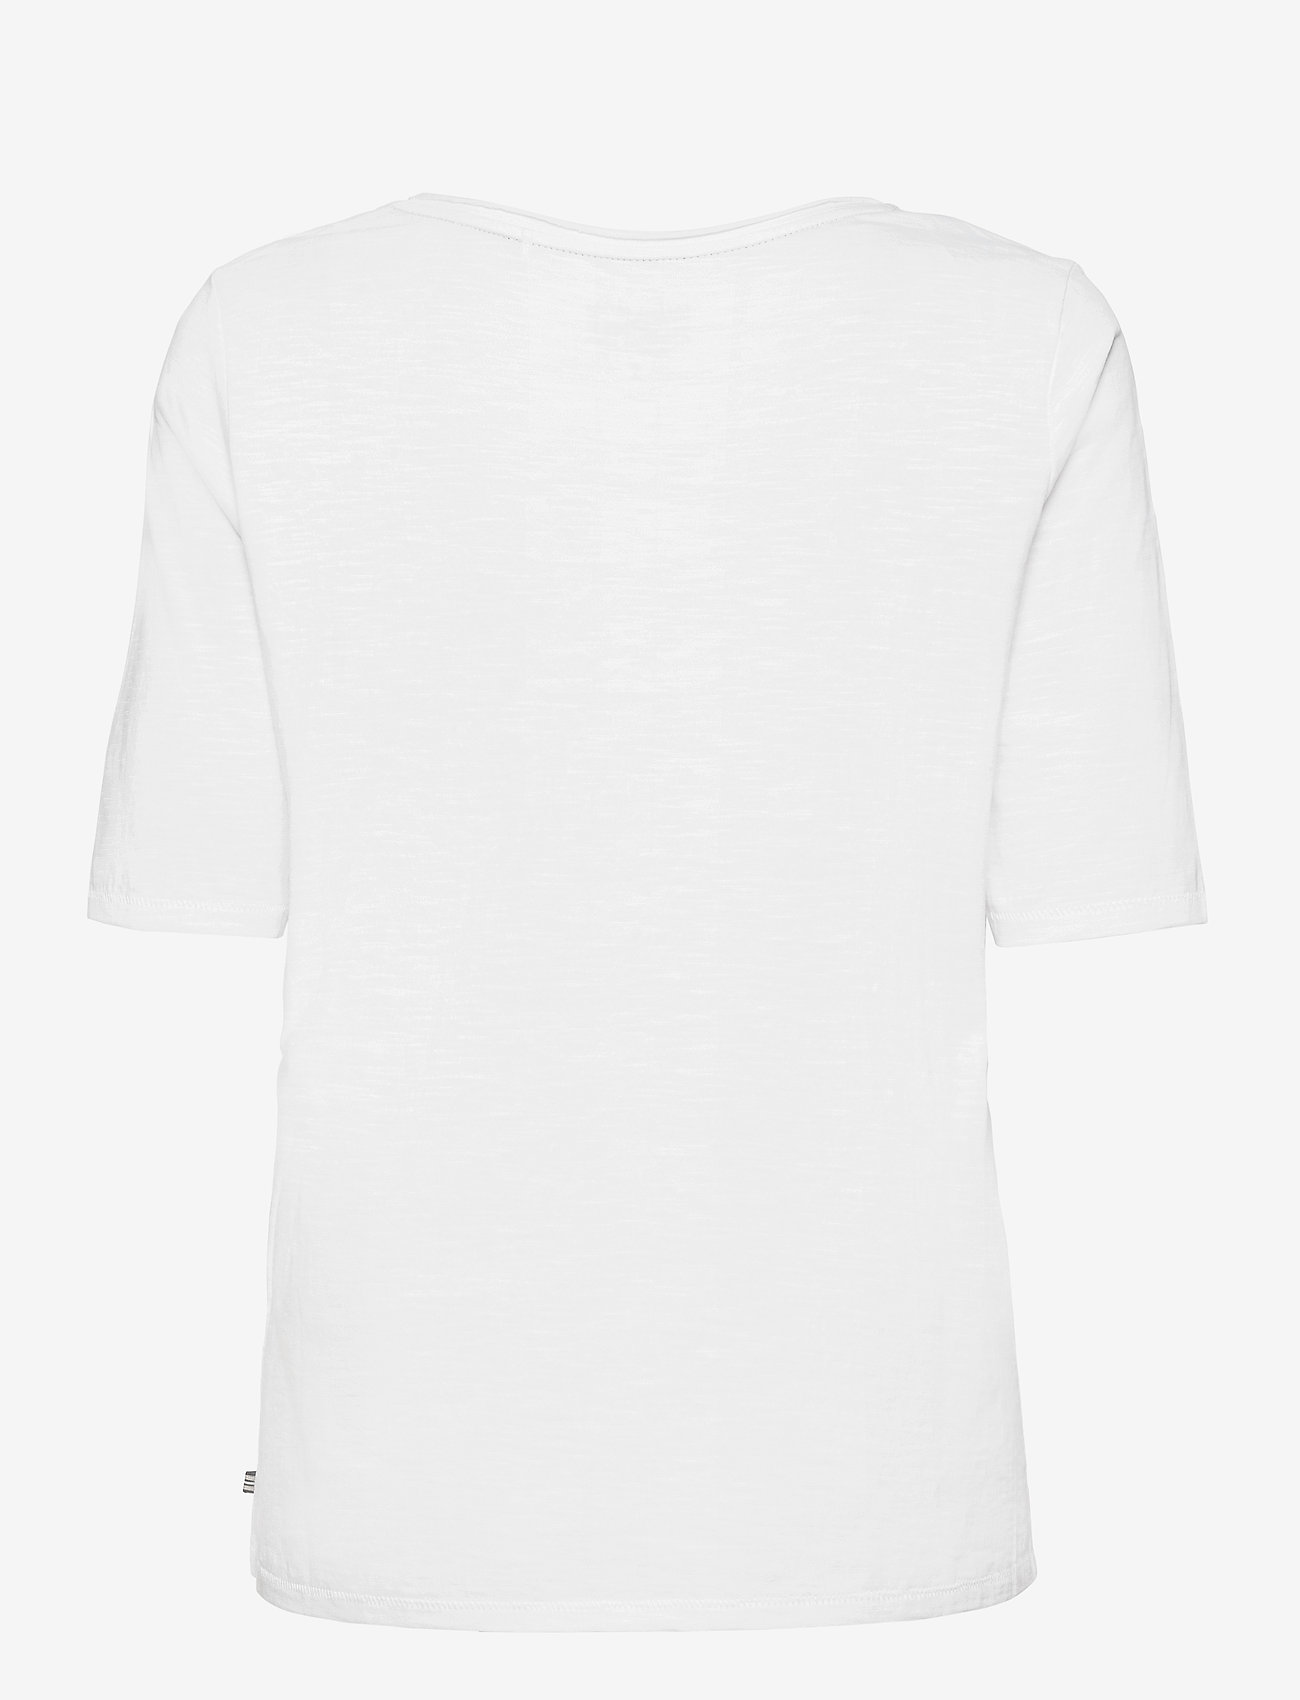 Esprit Casual - T-Shirts - t-shirts - white - 1